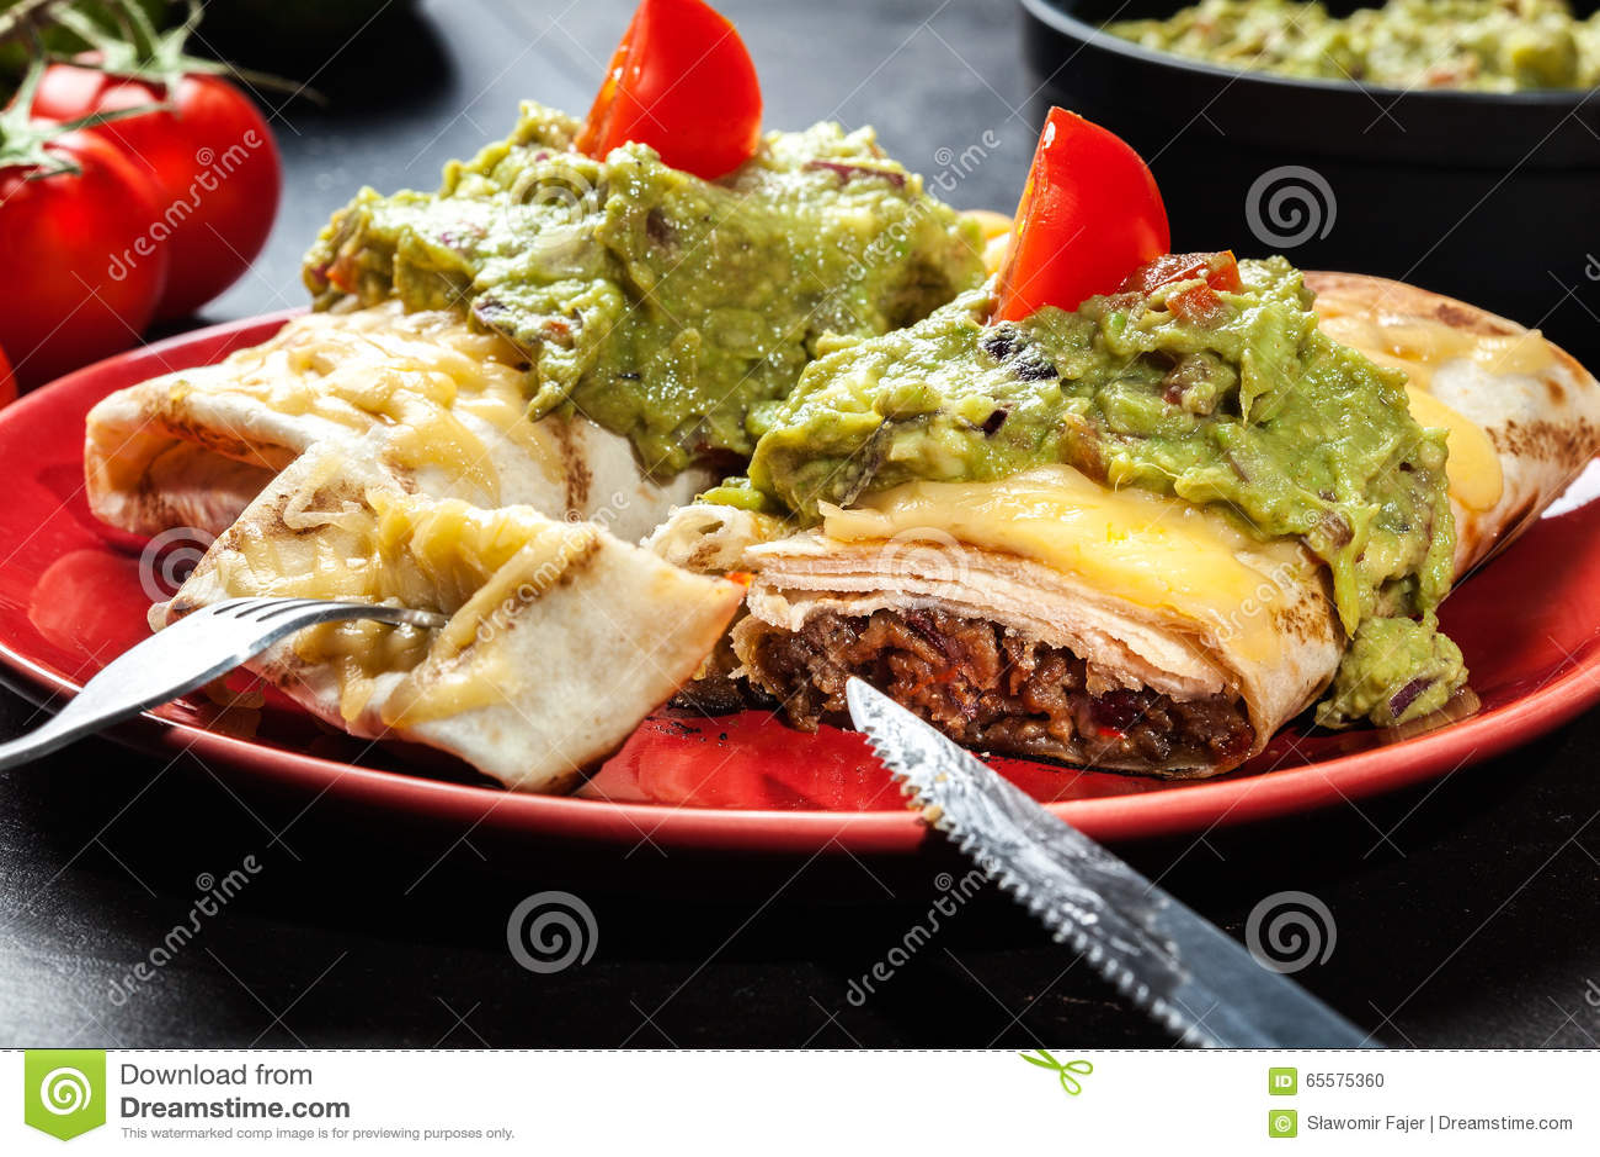 Chimichanga mexicano com mergulho do guacamole